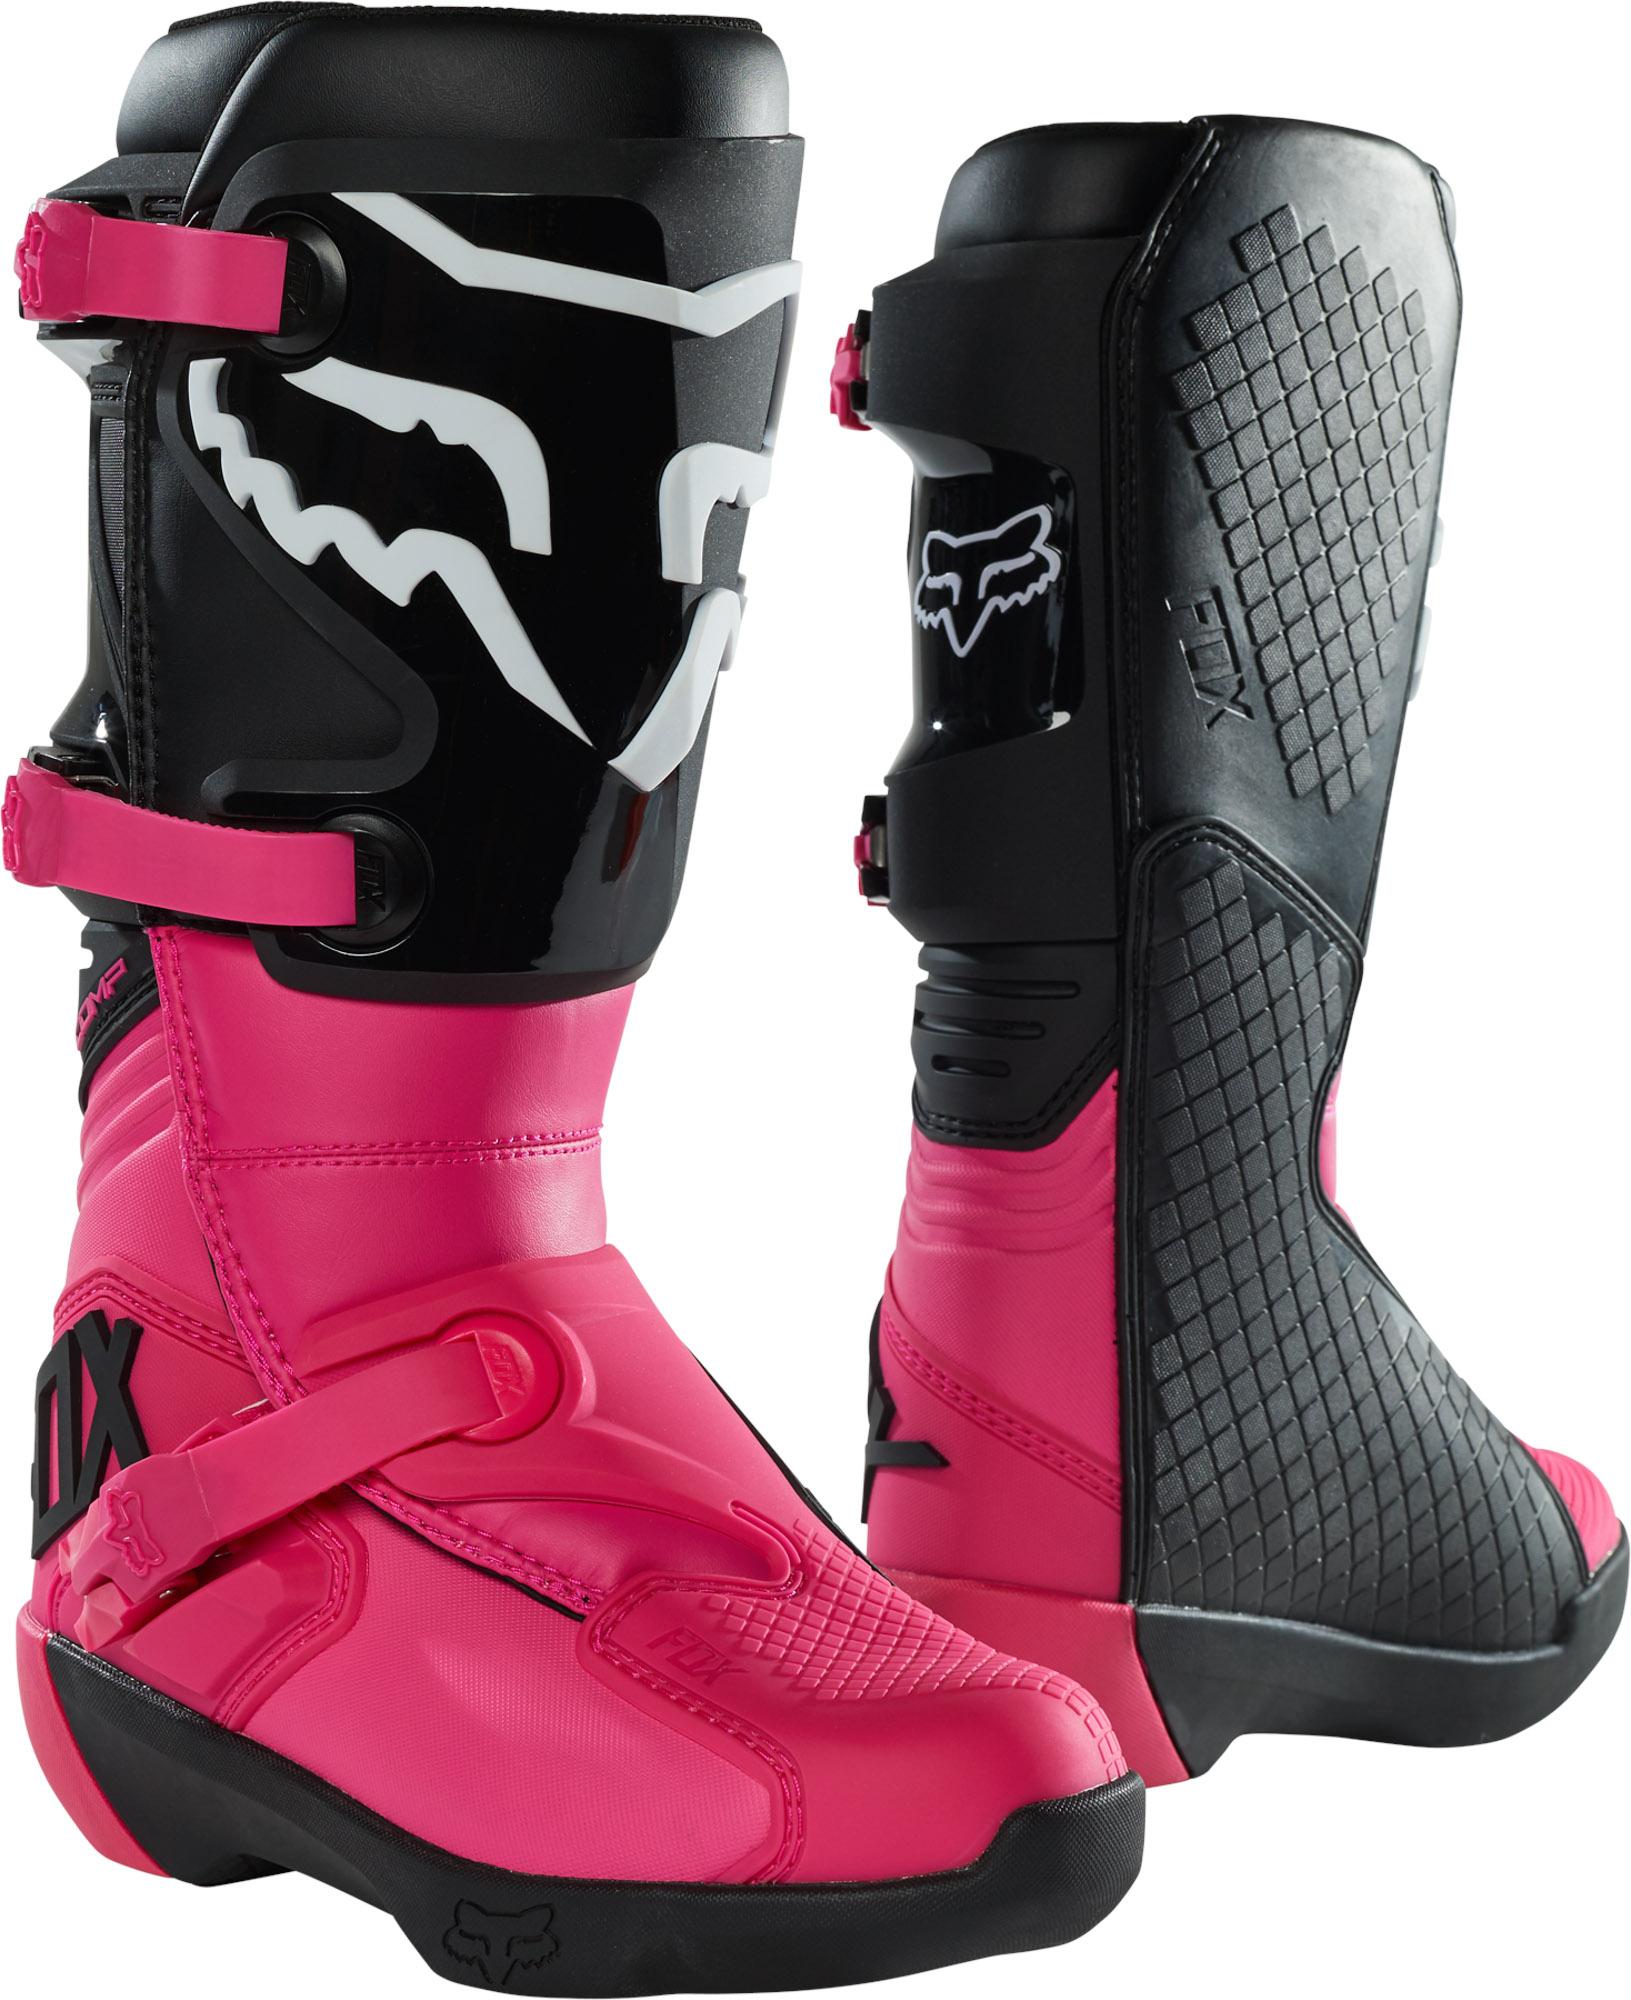 FOX Wmns Comp Boot - Buckle - BLACK/PINK MX22